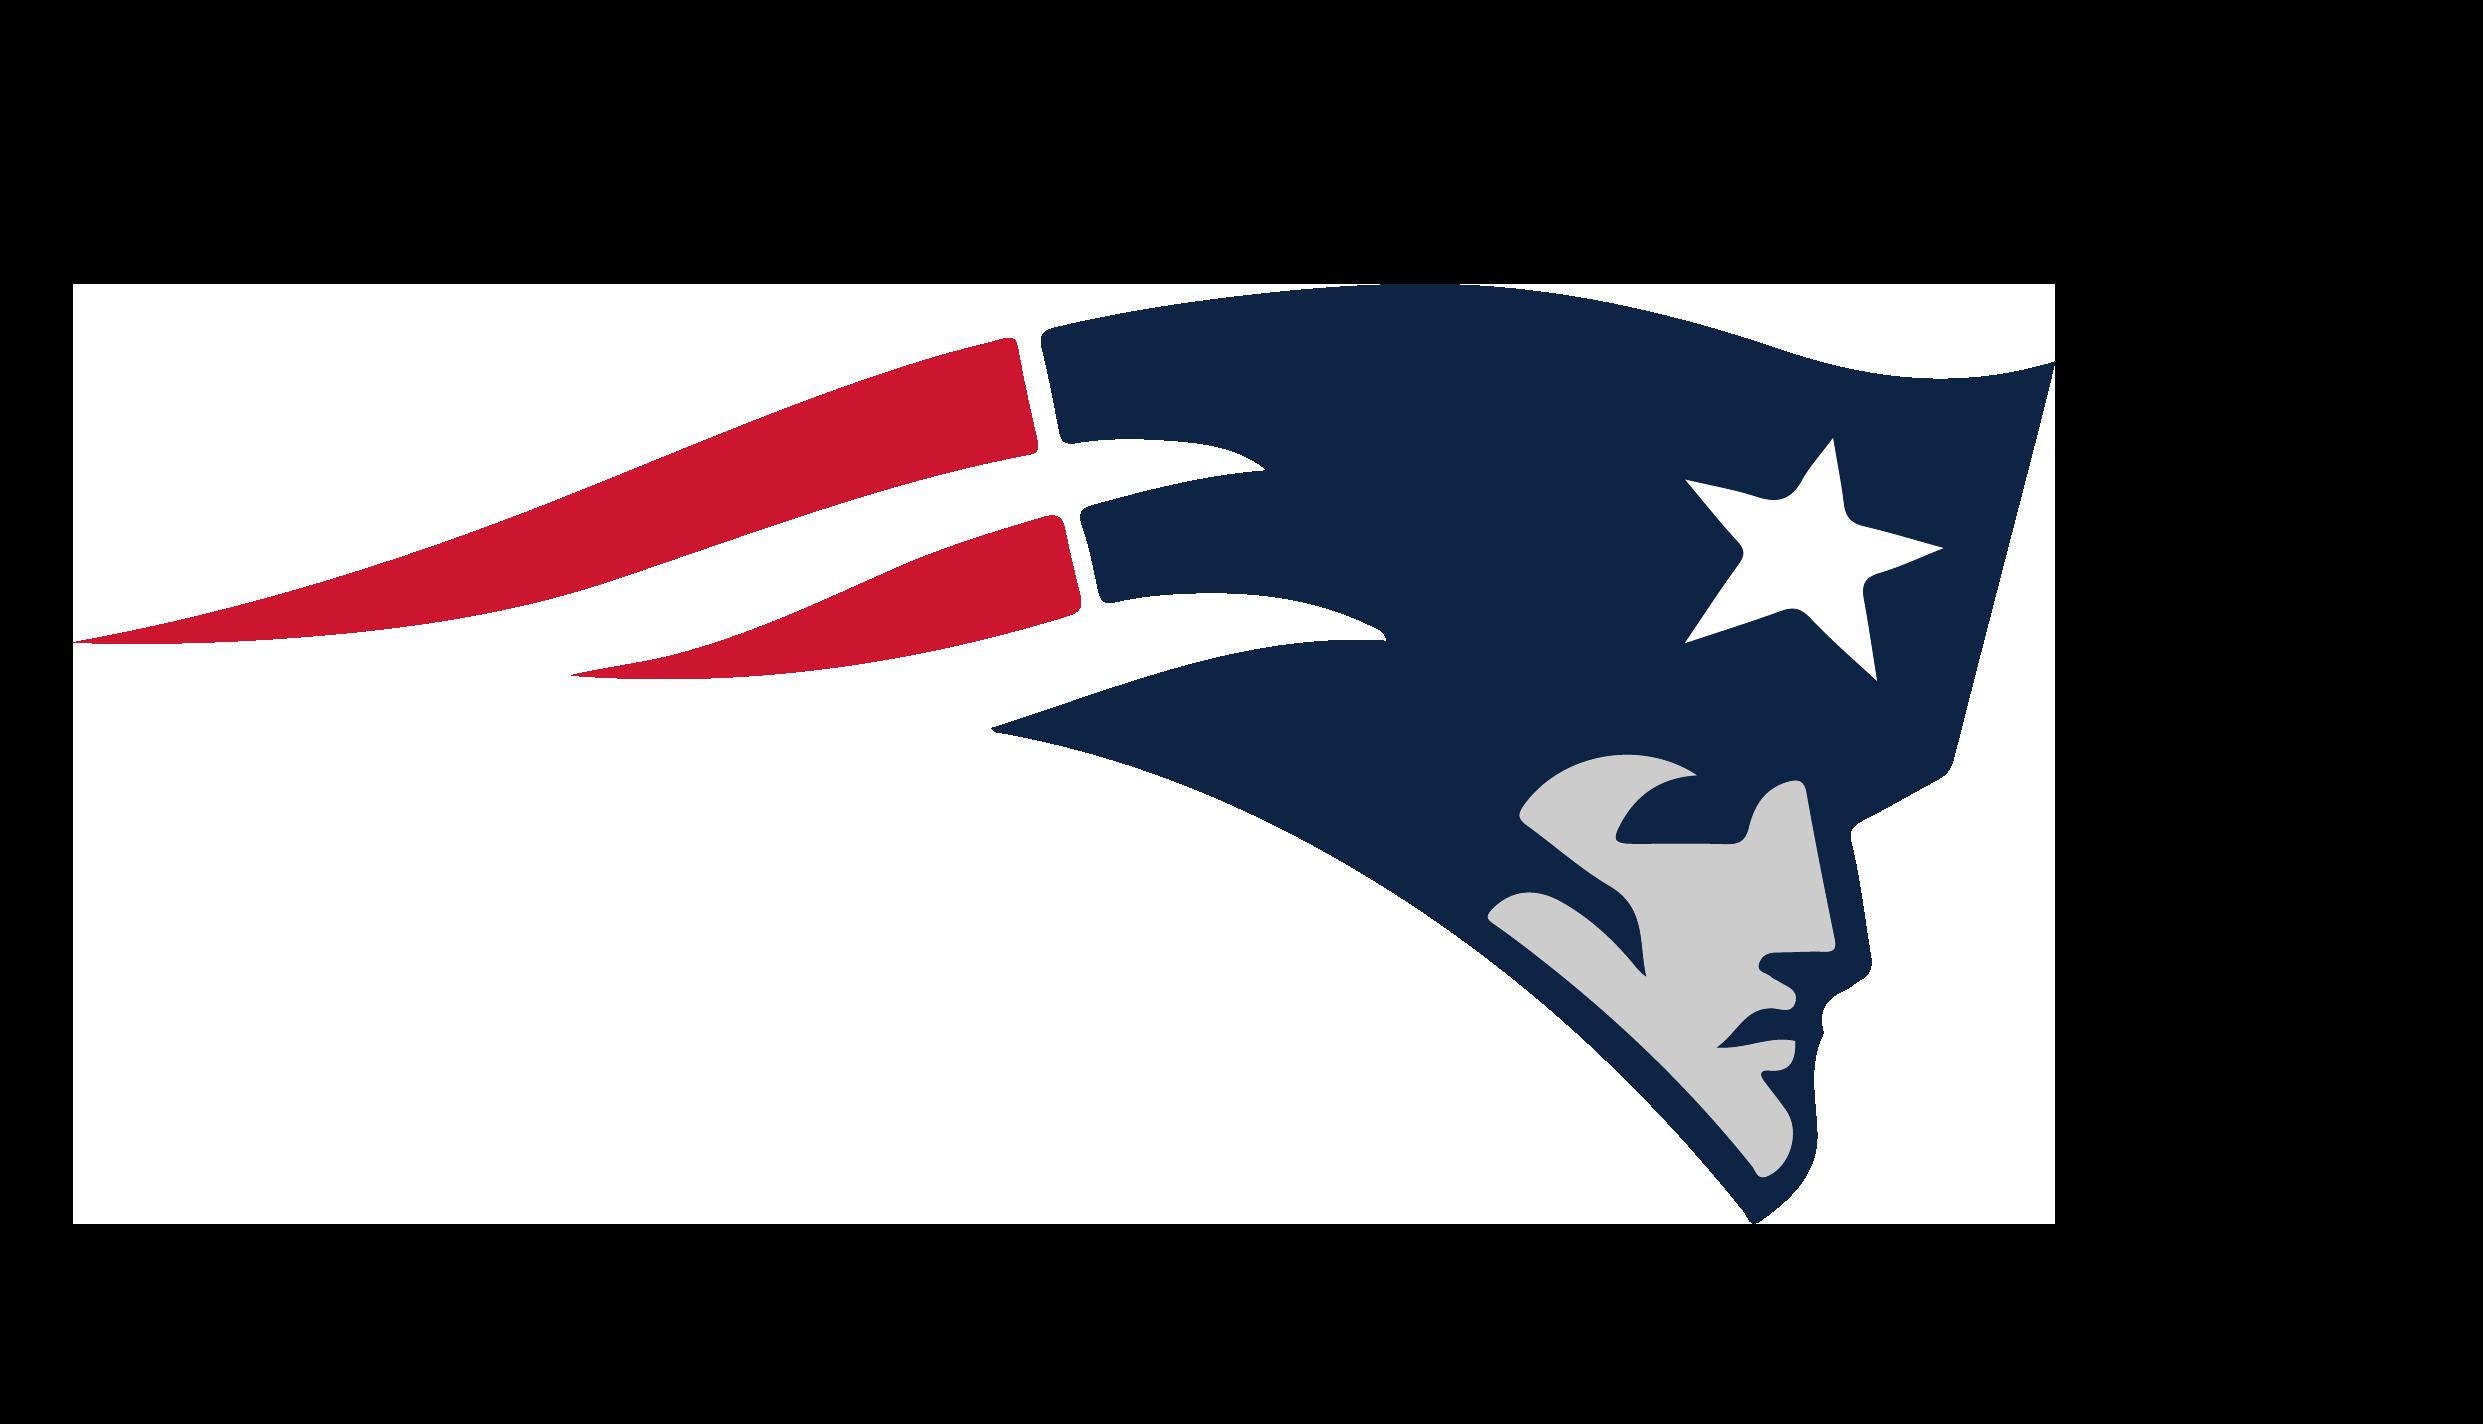 New england patriots Logo Symbol PNG Image.